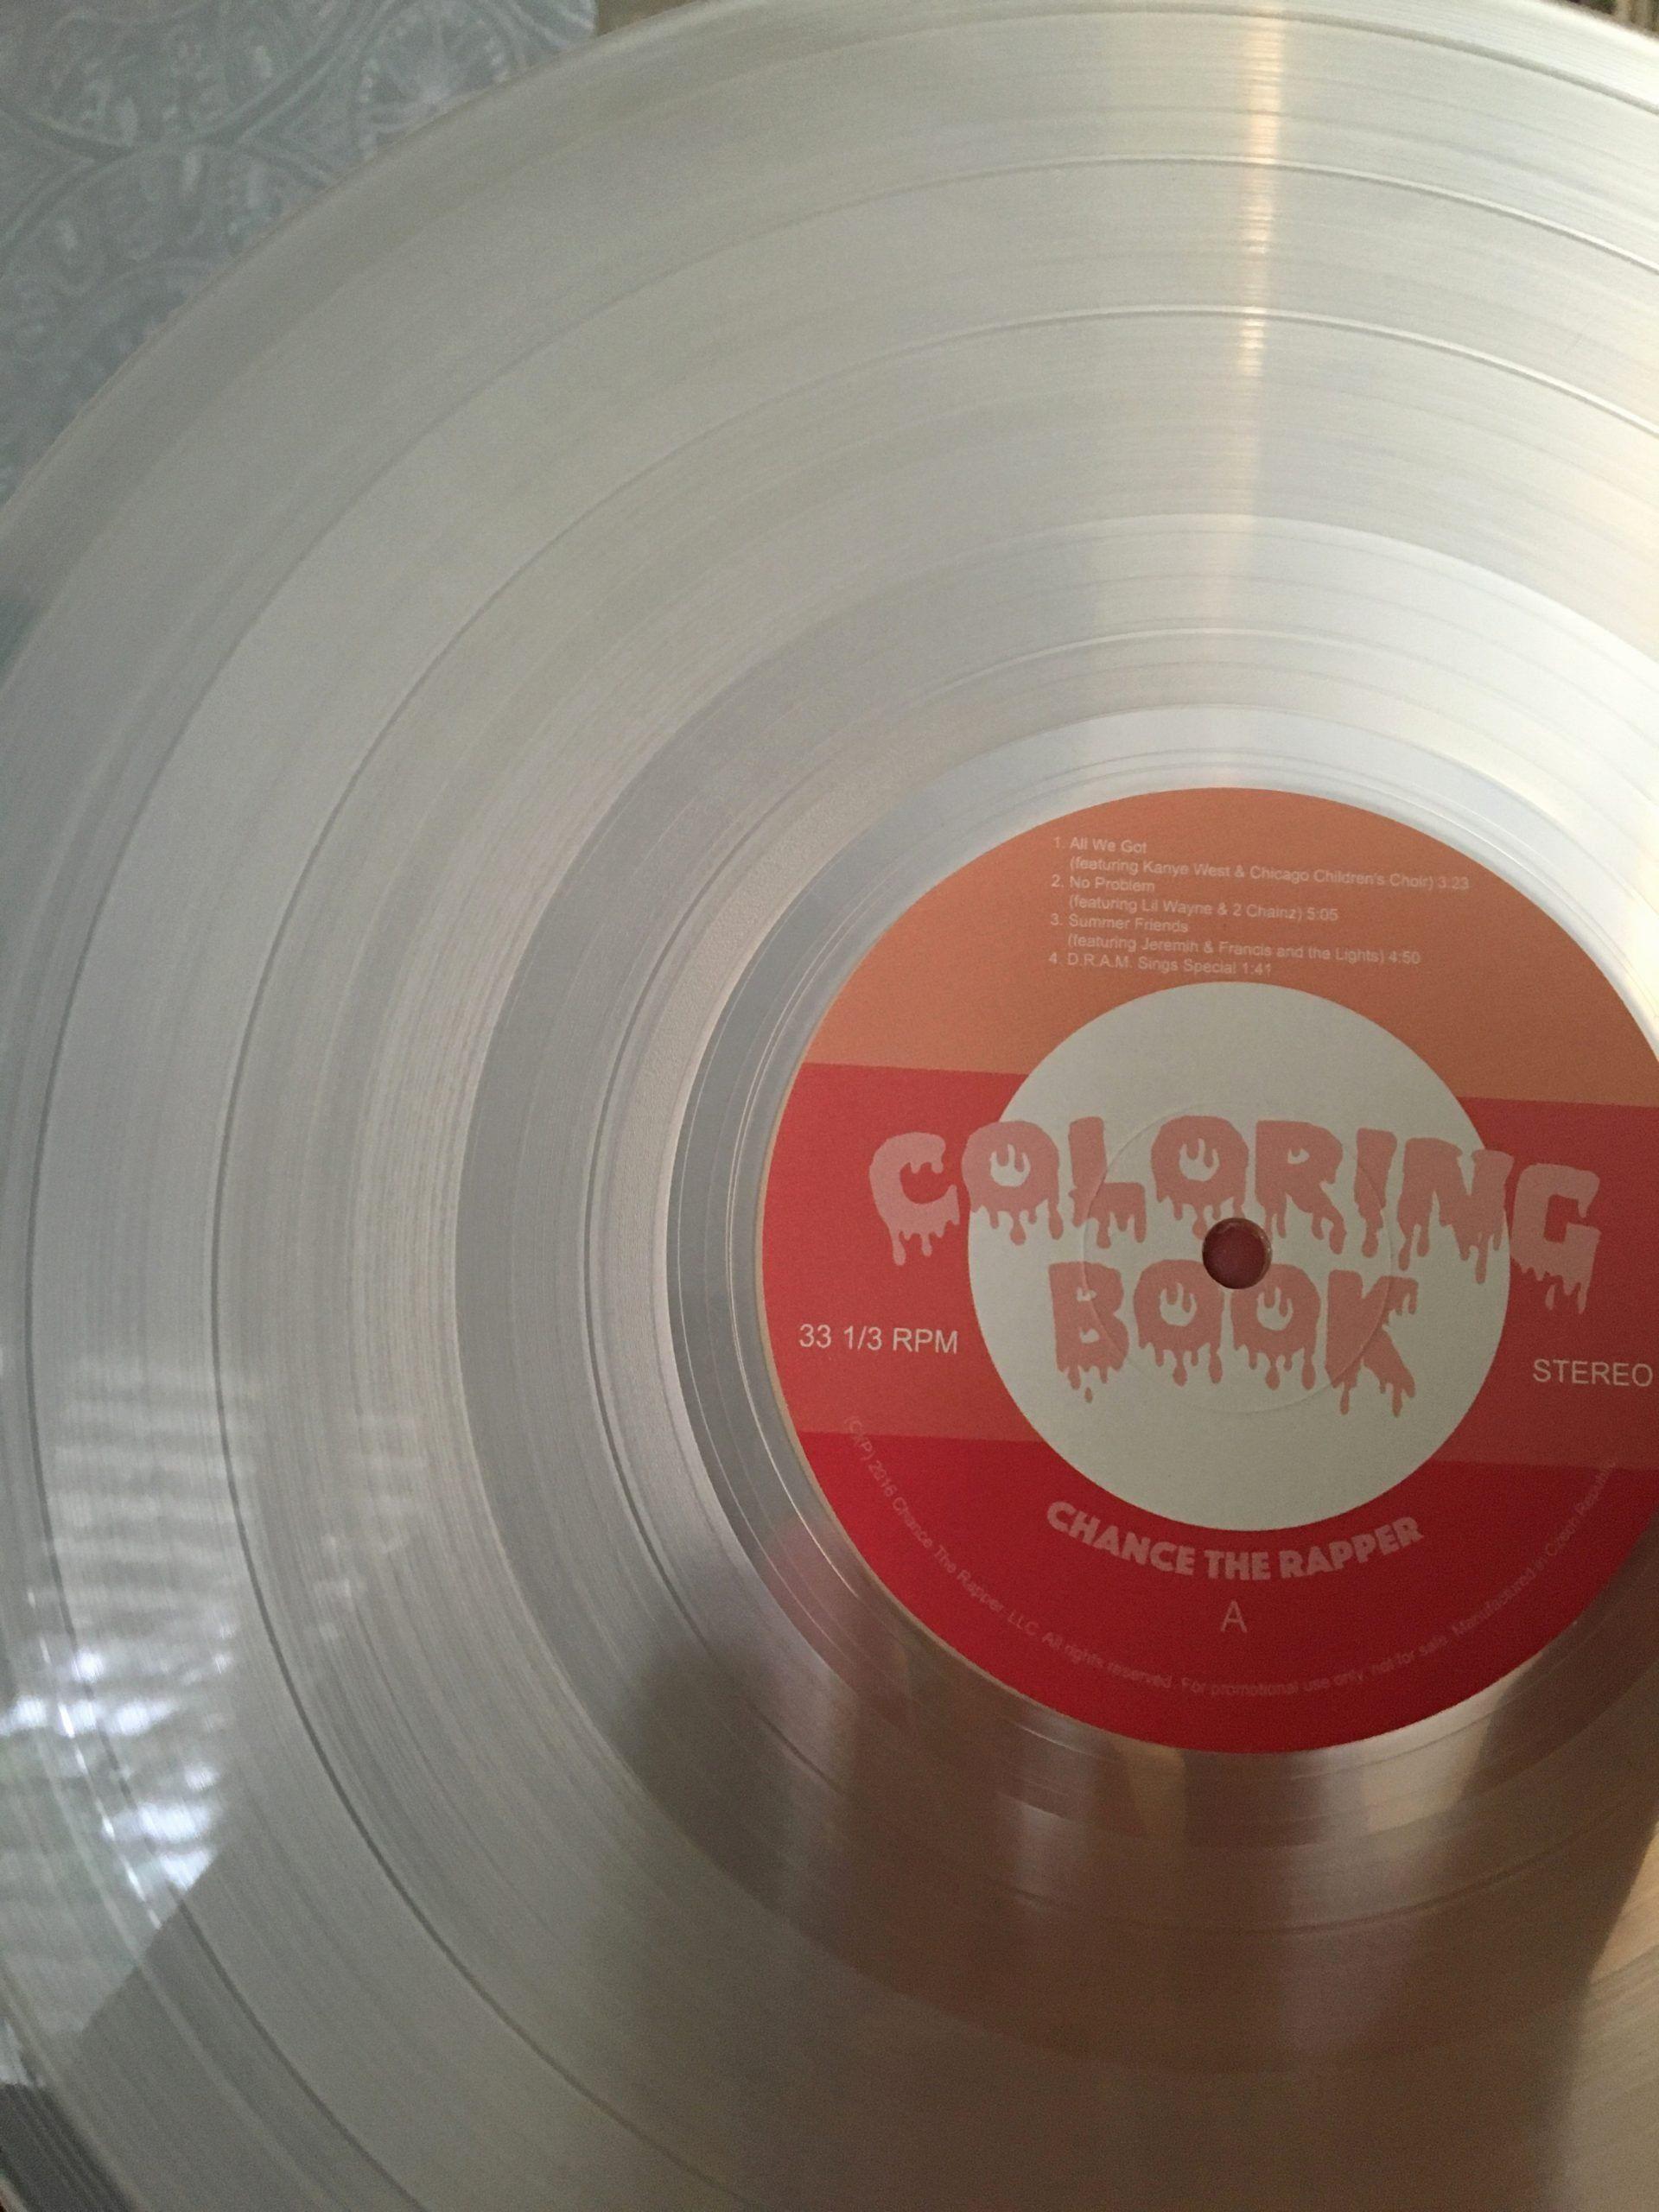 Coloring Book Track List Fresh Hip Hop Vinyl Vinyl Void Coloring Book Chance Coloring Book Album Chance The Rapper